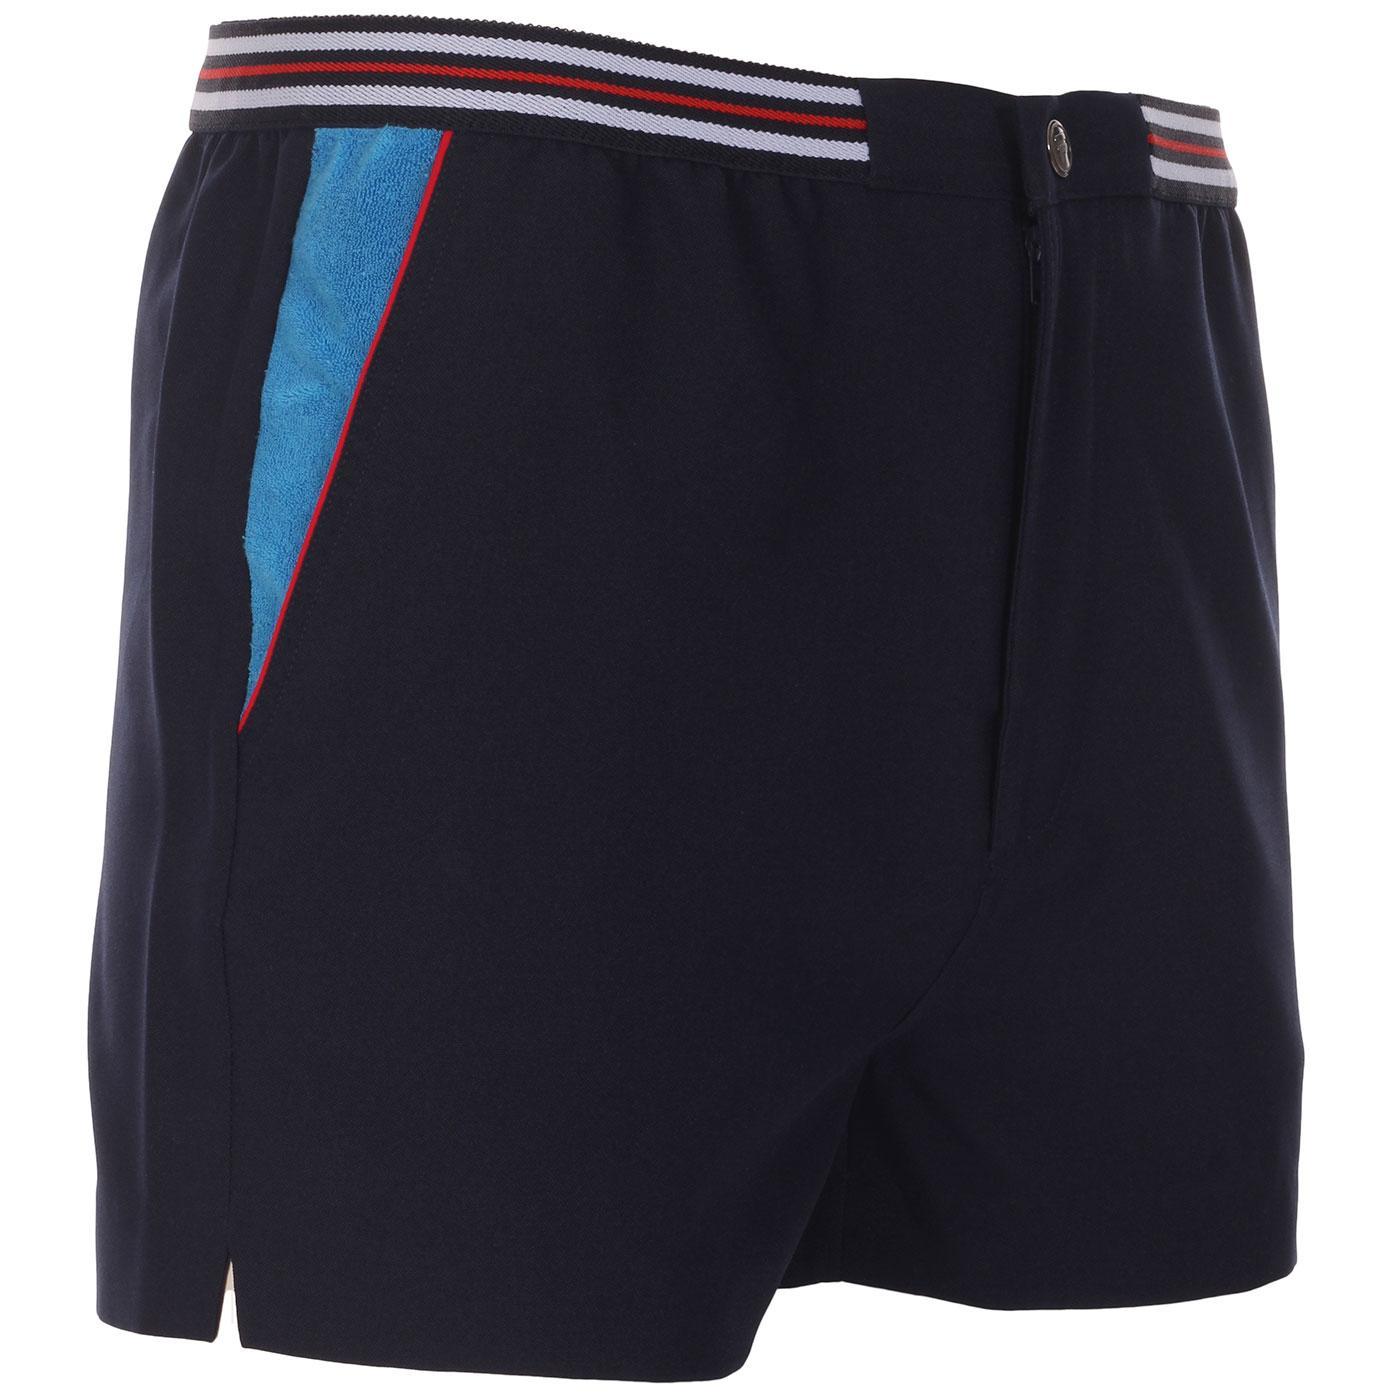 High Tide 4 FILA VINTAGE Retro 70s Tennis Shorts P